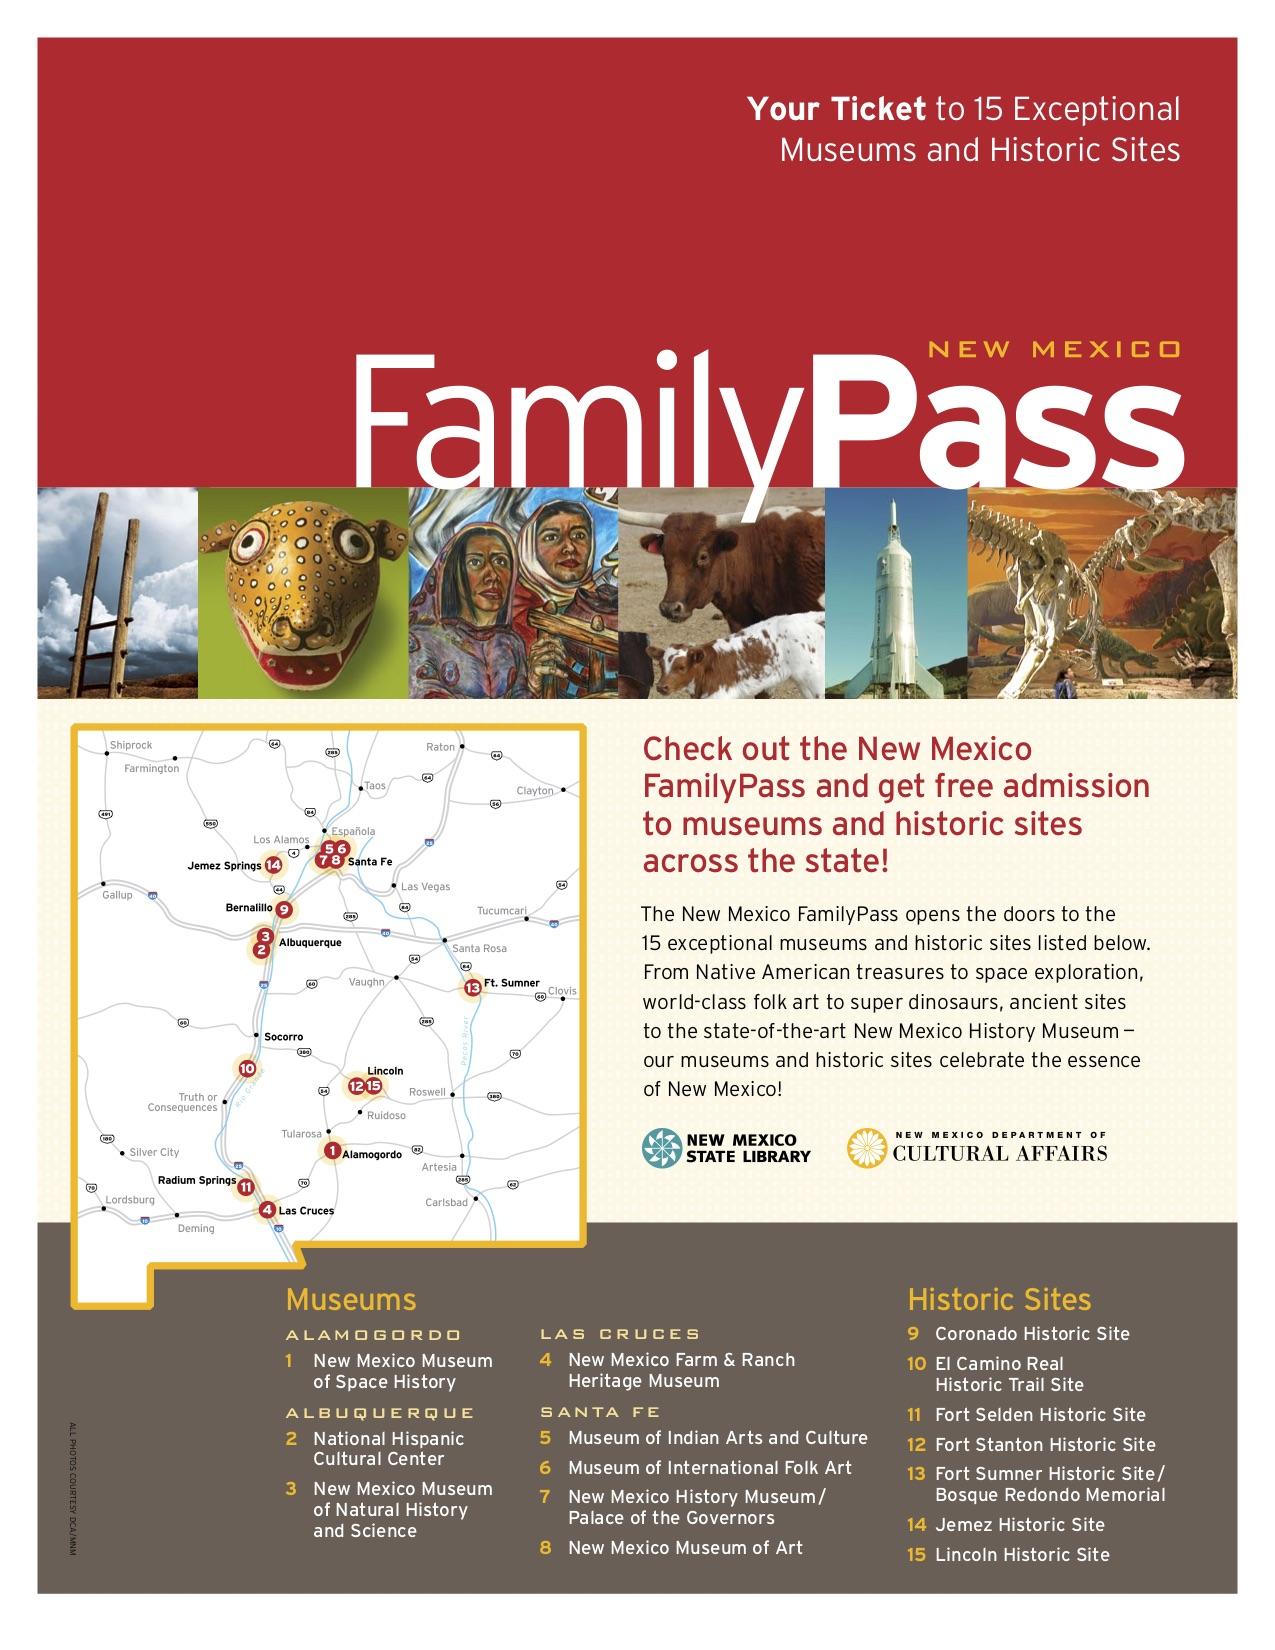 NMSL_FamilyPass_flyer.jpg